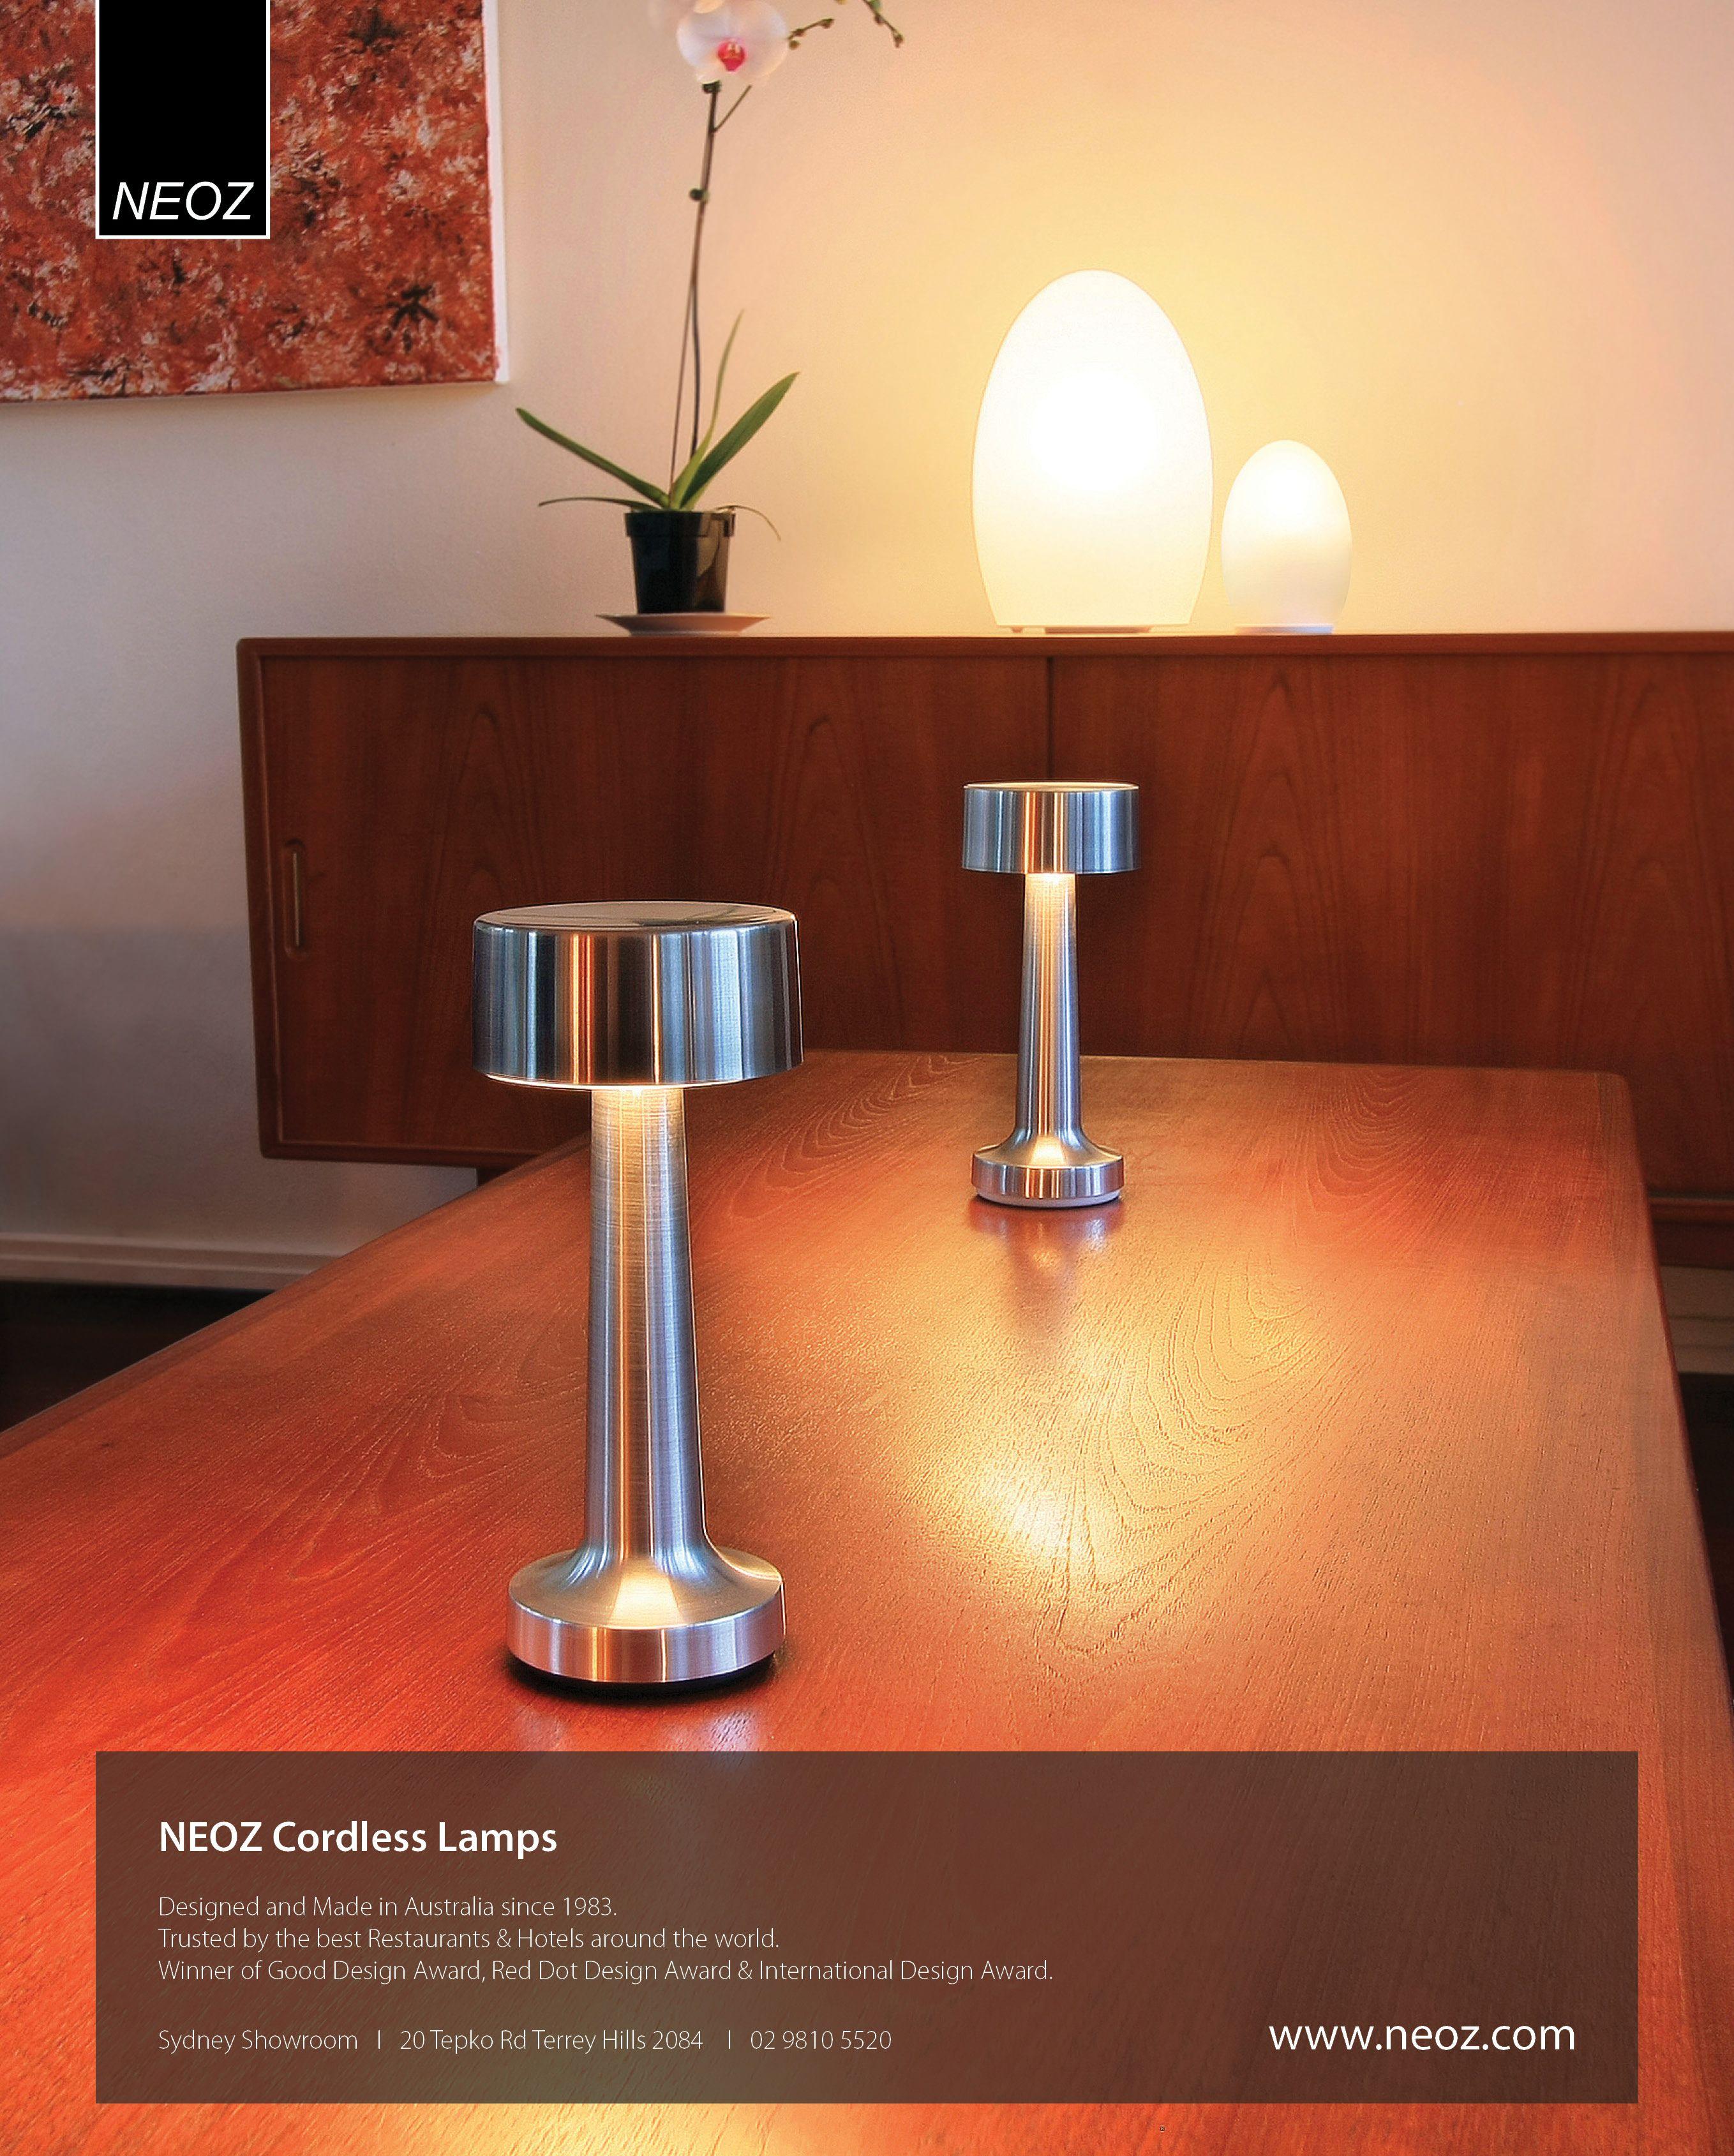 Neoz   Cooee 2c   Copper Color   Cordless lamps, Lamp ...